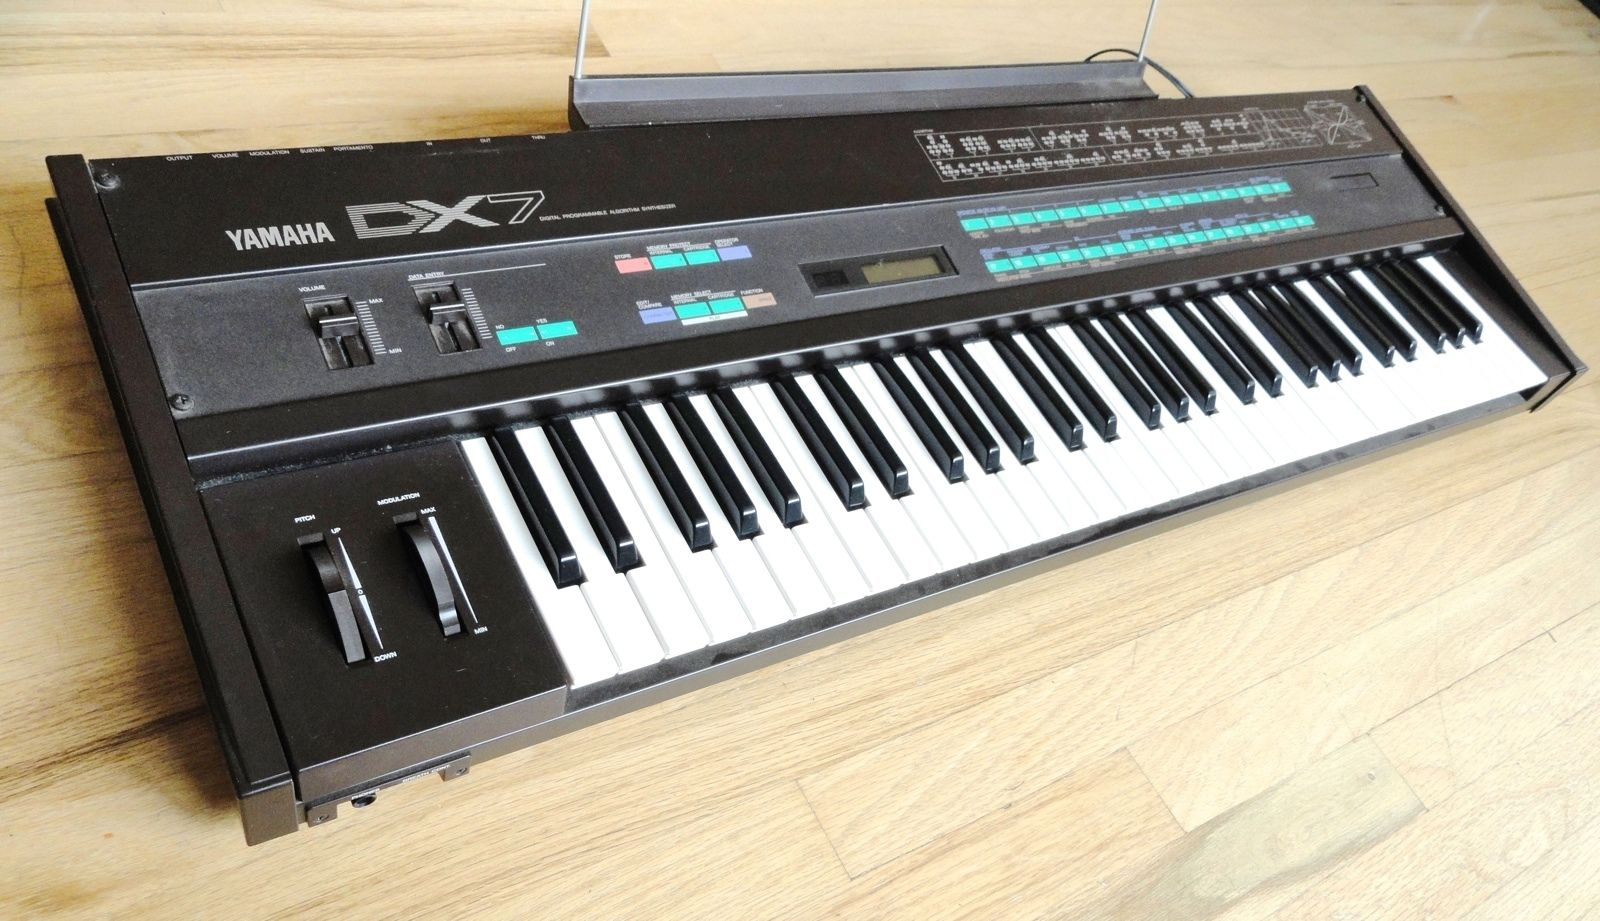 Dx7 ii manual